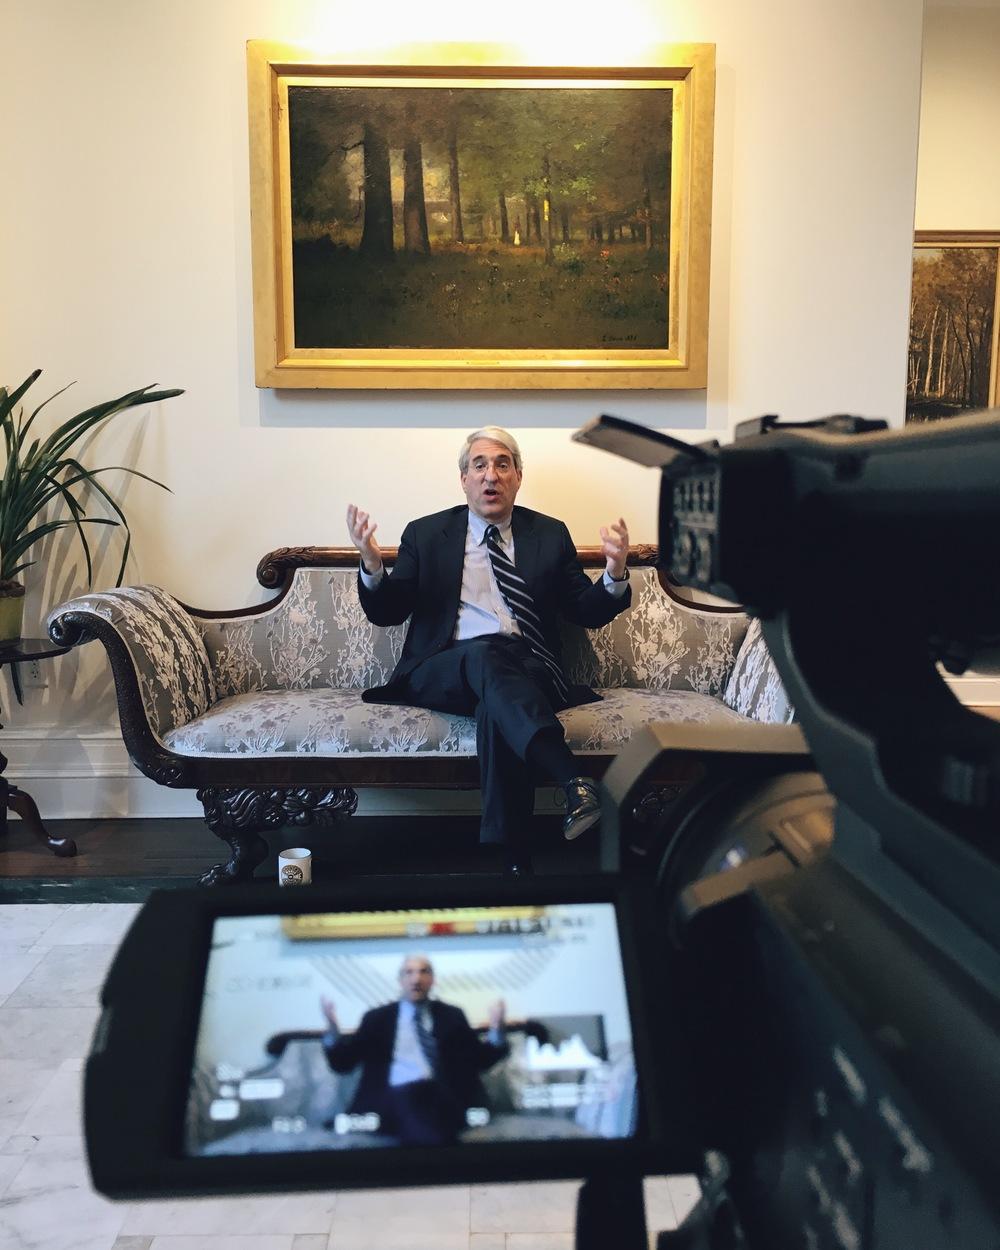 President Salovey